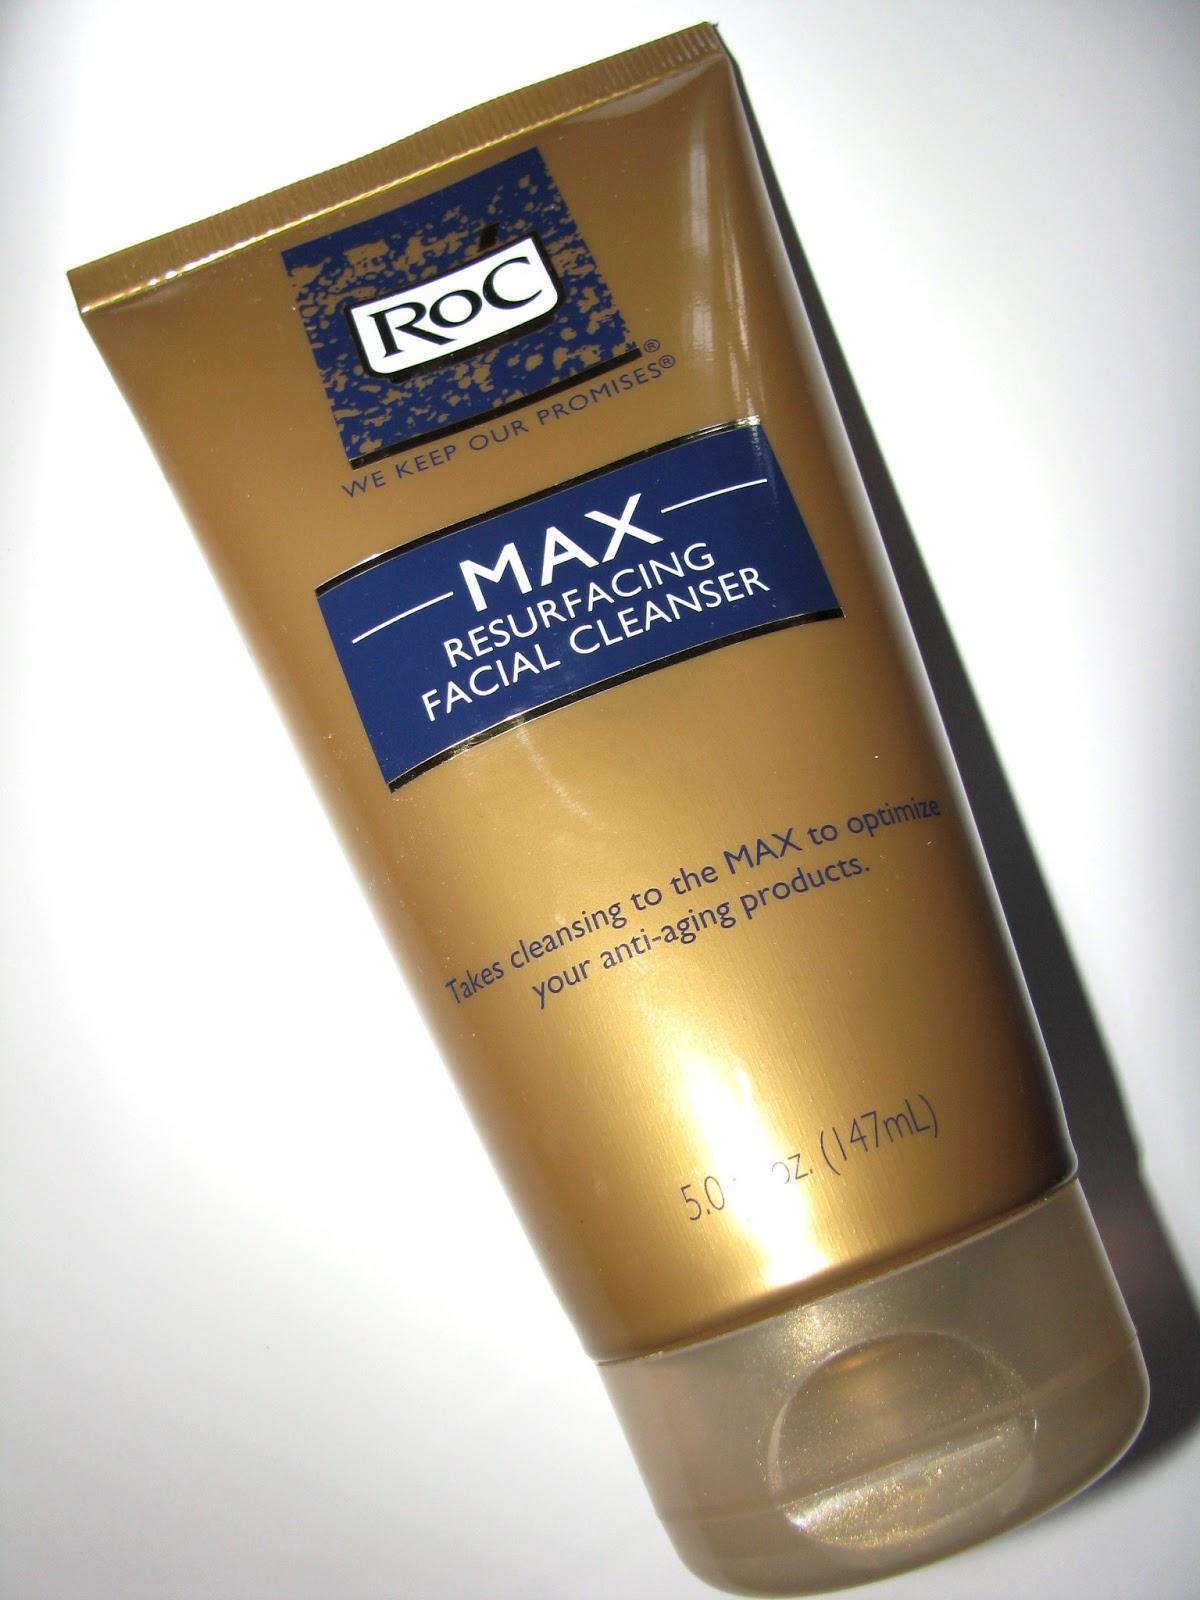 The Beauty Alchemist Roc Max Resurfacing Cleanser